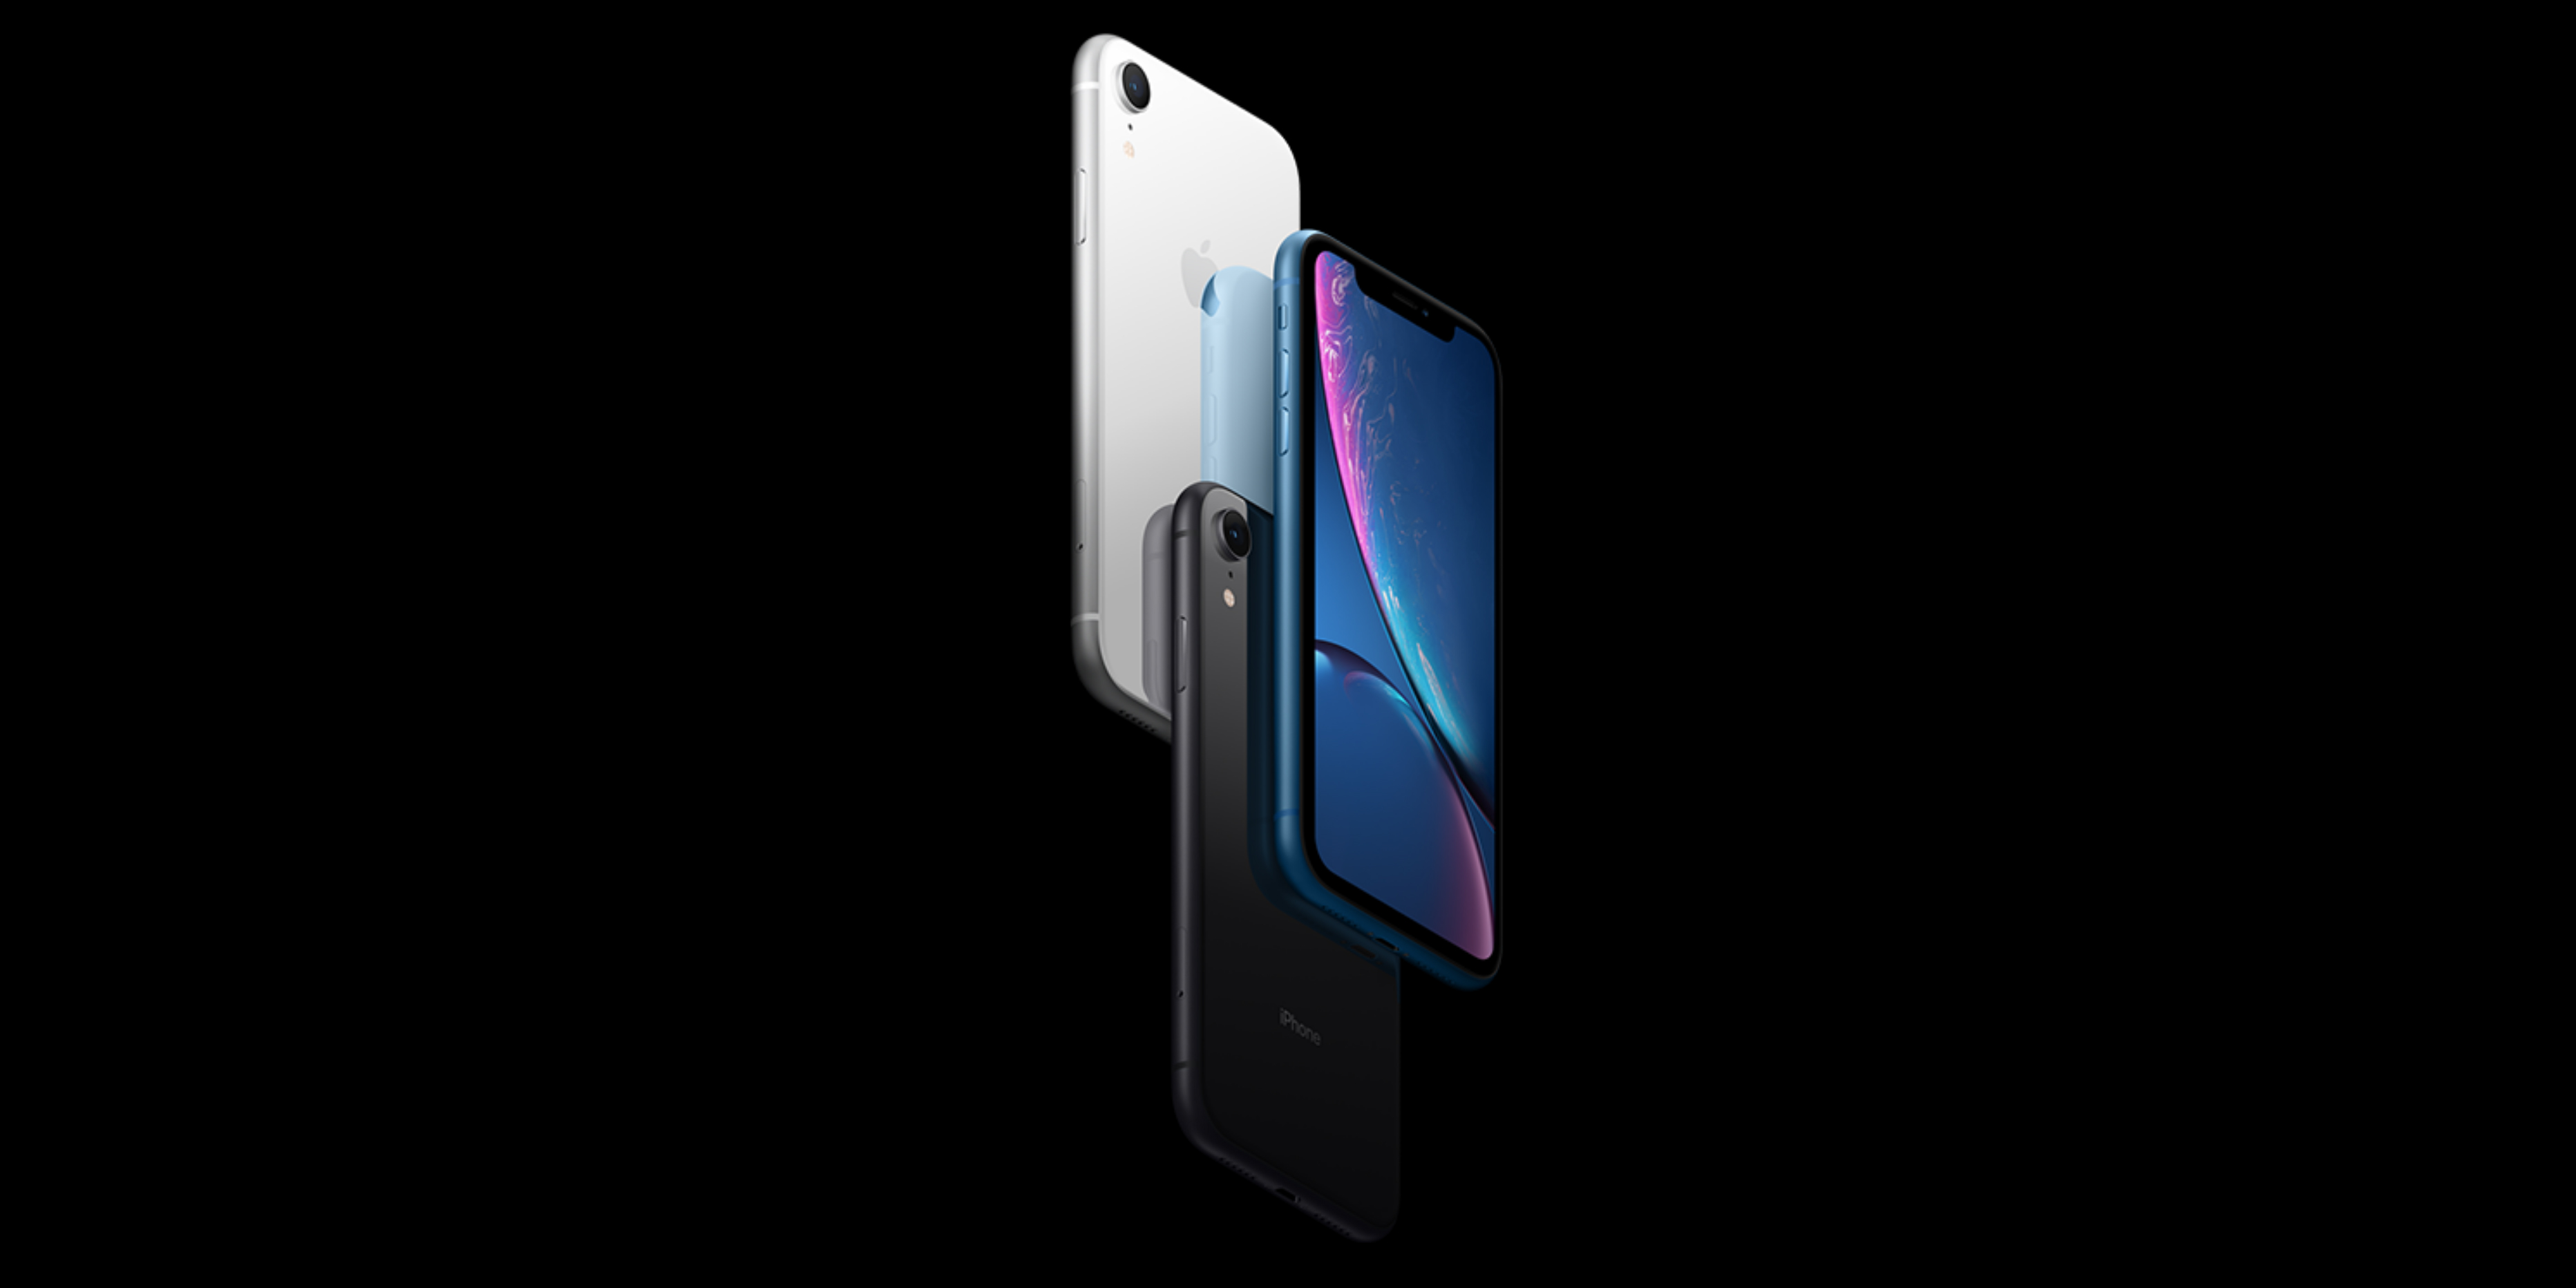 Best iPhone XR pre-order deal